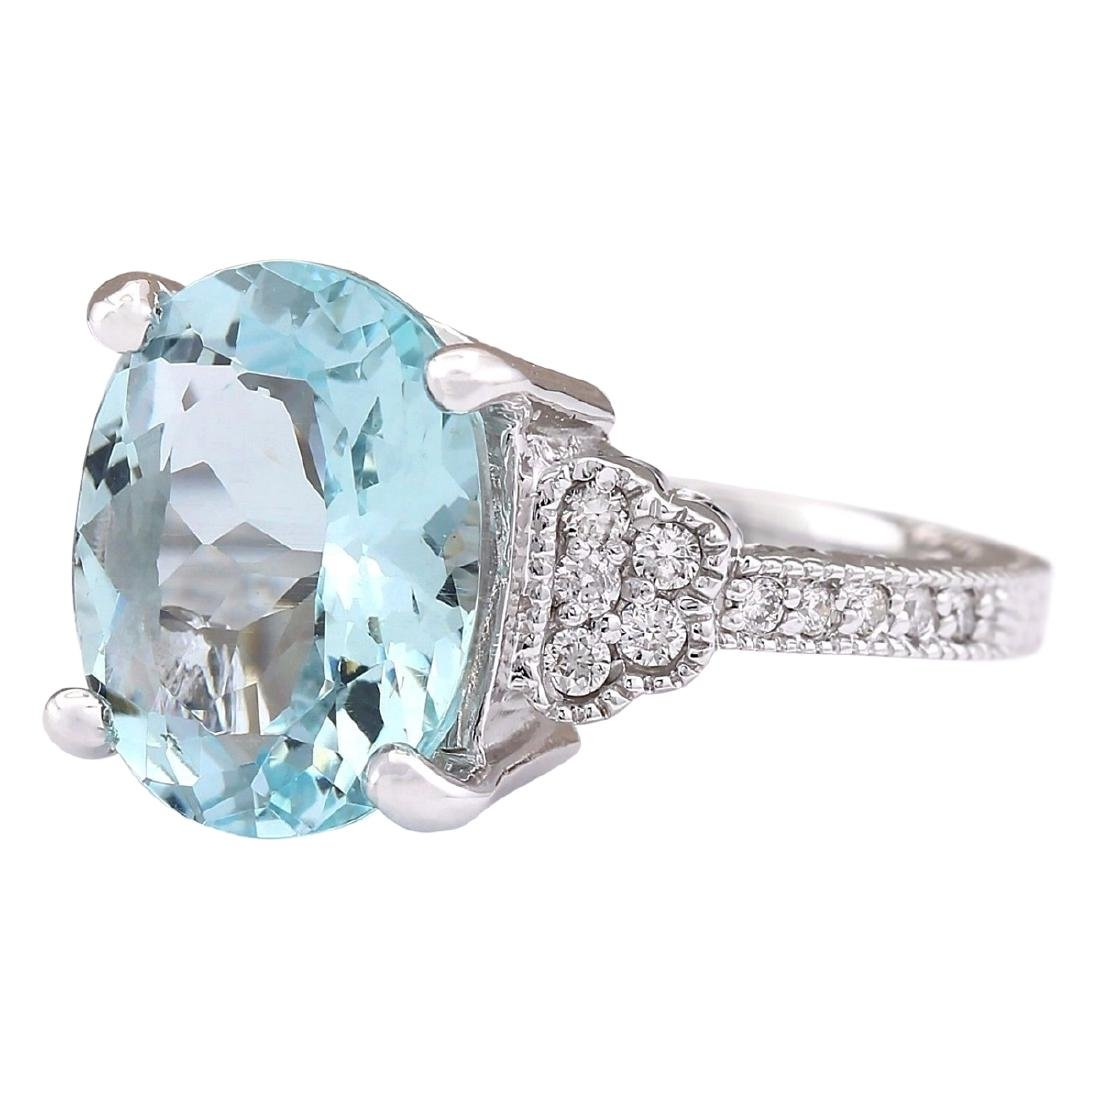 5.89 CTW Natural Aquamarine And Diamond Ring In 18K - 2